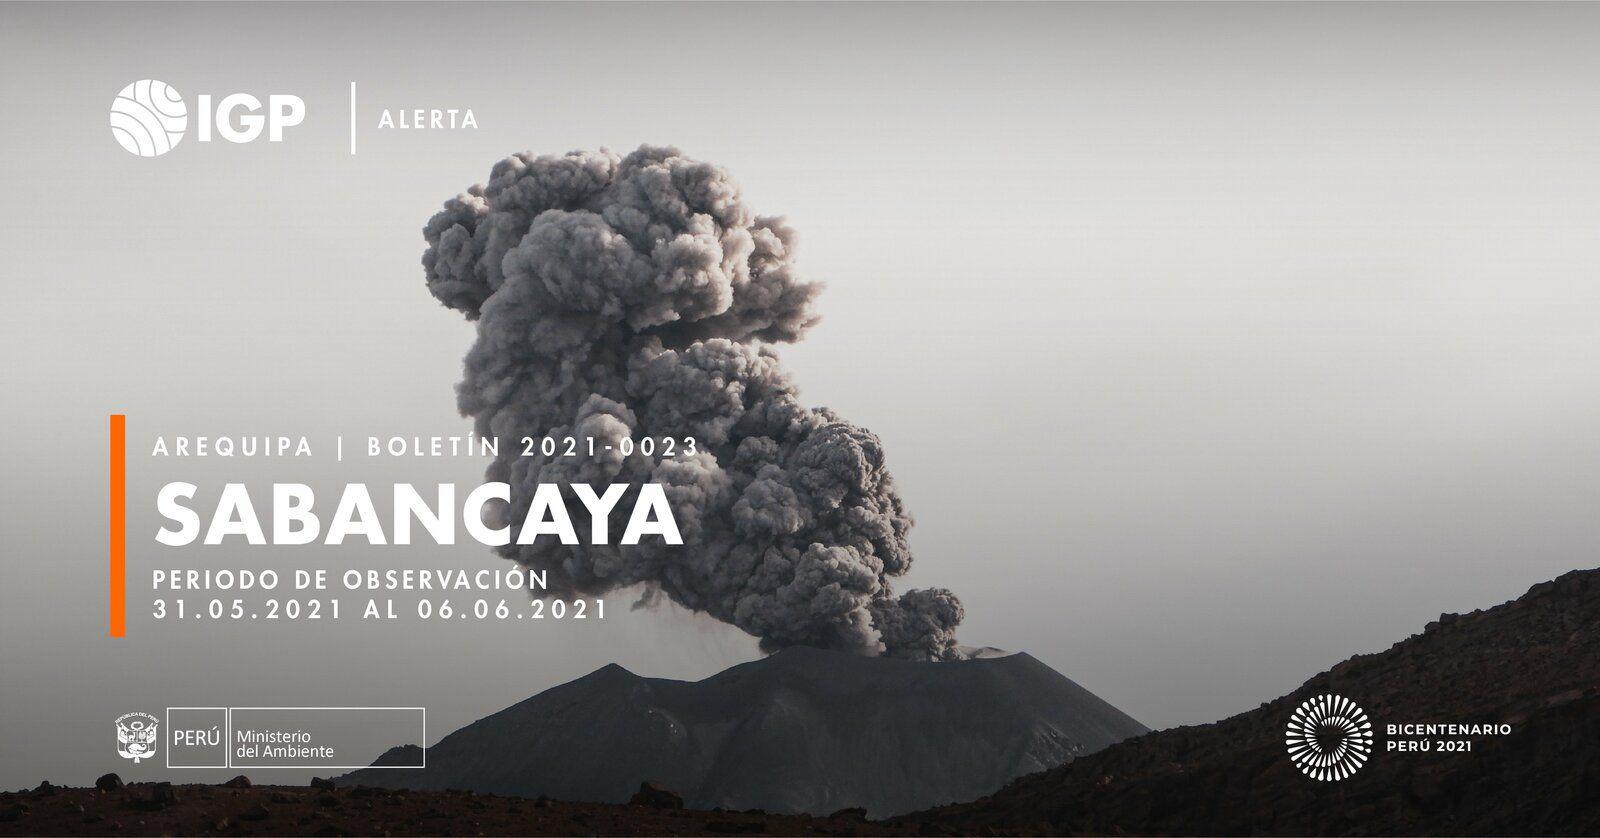 Sabancaya - activity report from 05.31 to 06.06.2021 / IGPeru